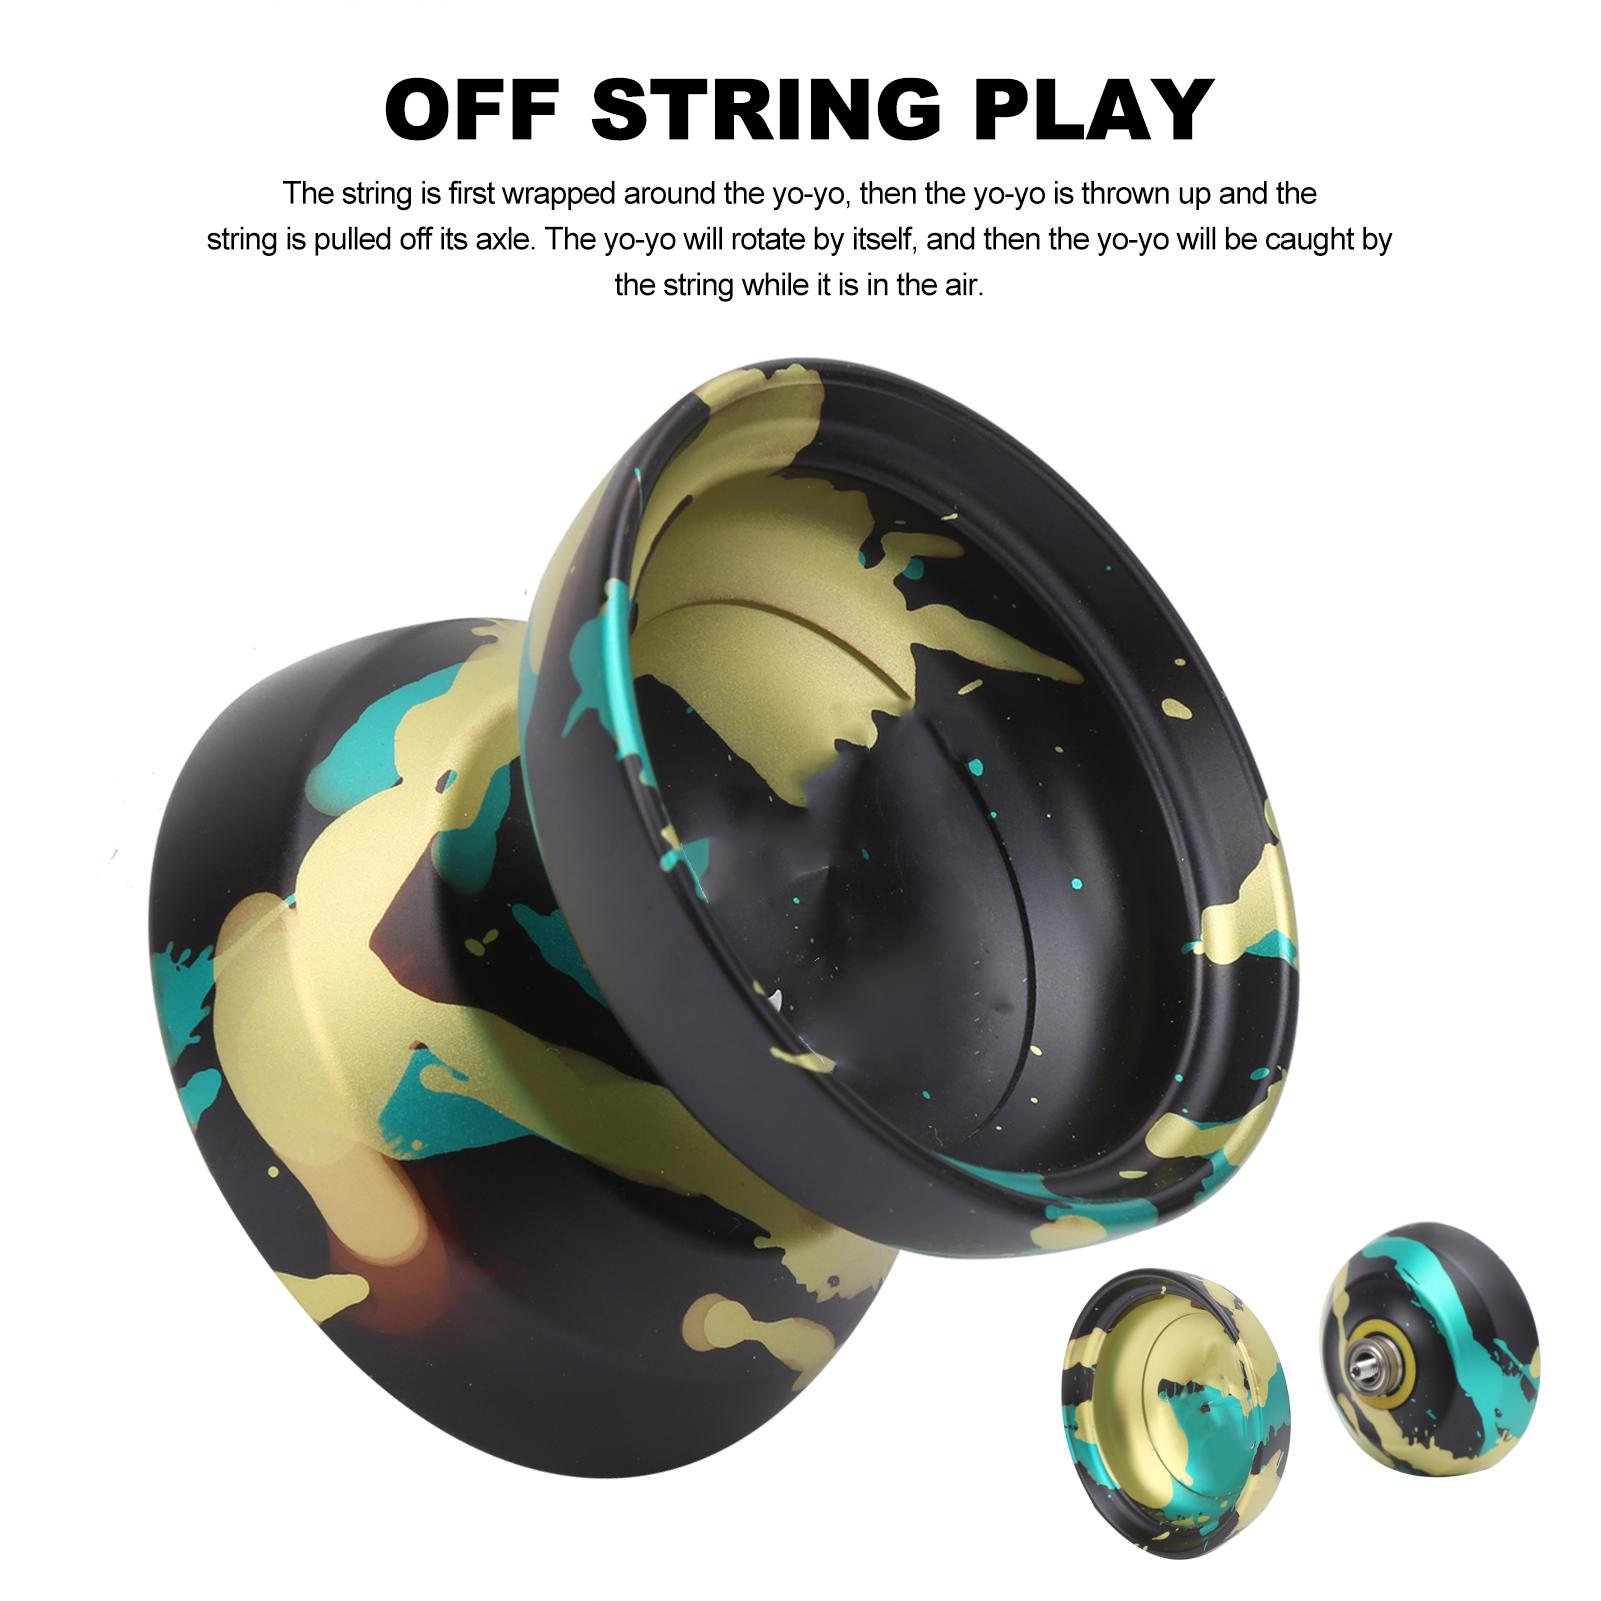 thumbnail 6 - Yoyo Ball Alloy Yoyo Toy With Replacement Yoyo Strings Kid Fun Game Play Toy